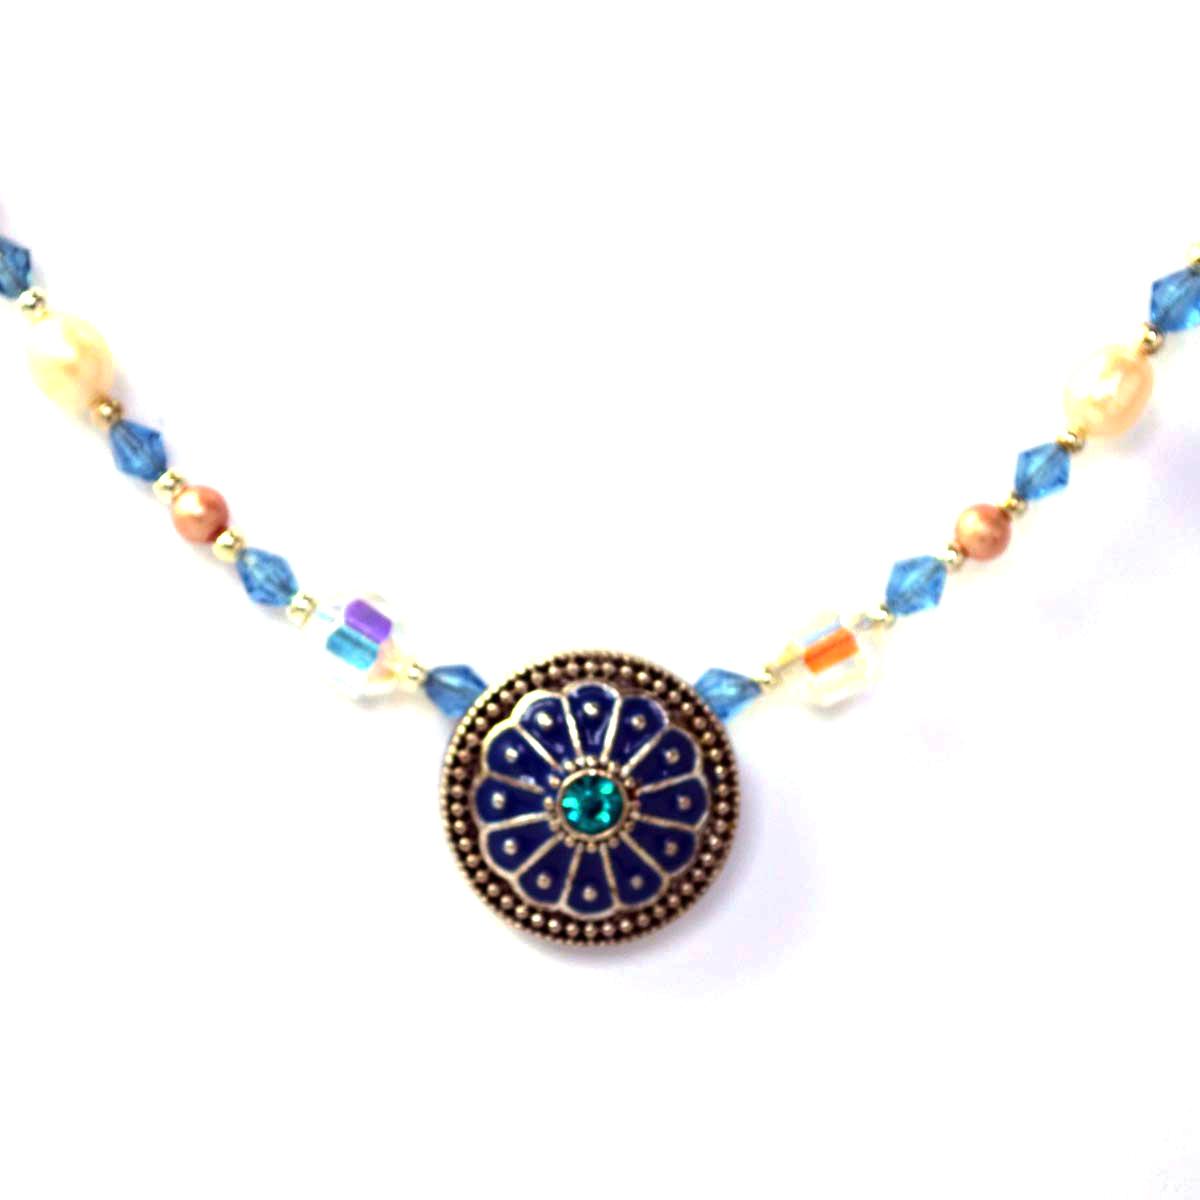 upcycled jewellery